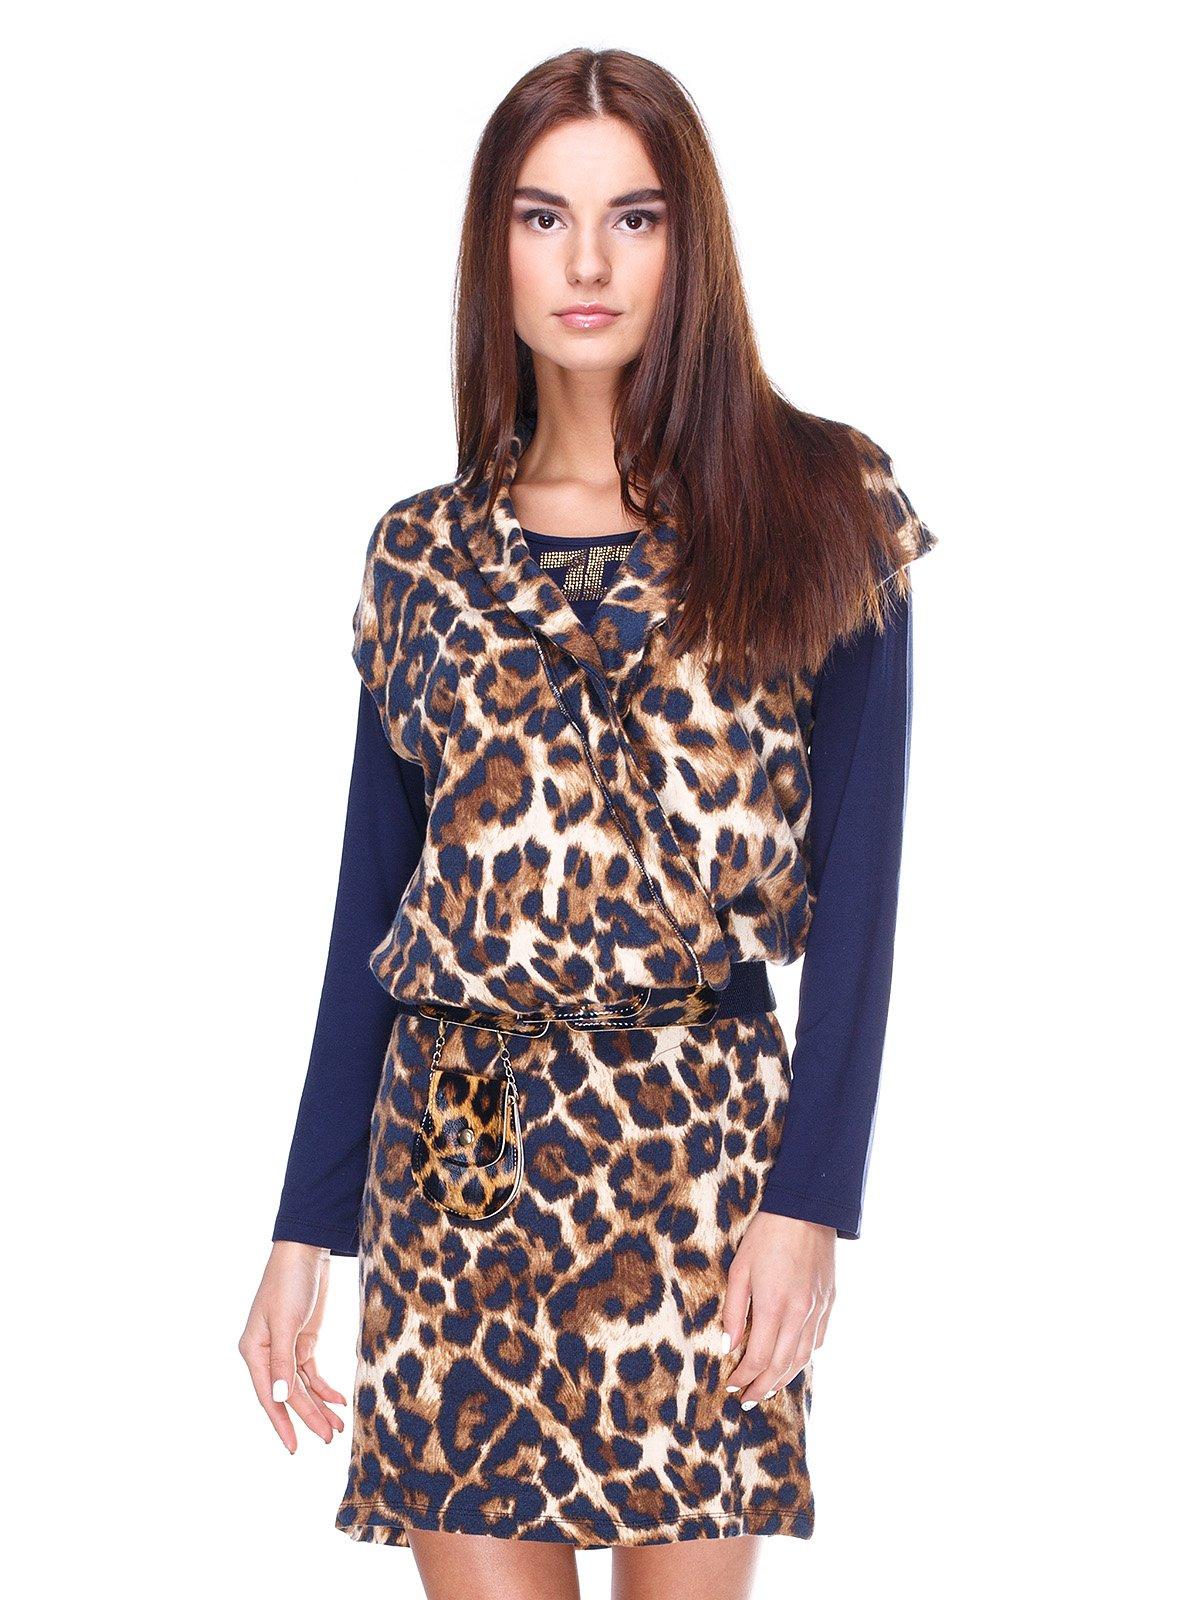 d18ed77040e Платье сине-коричневое с анималистическим принтом — Stella